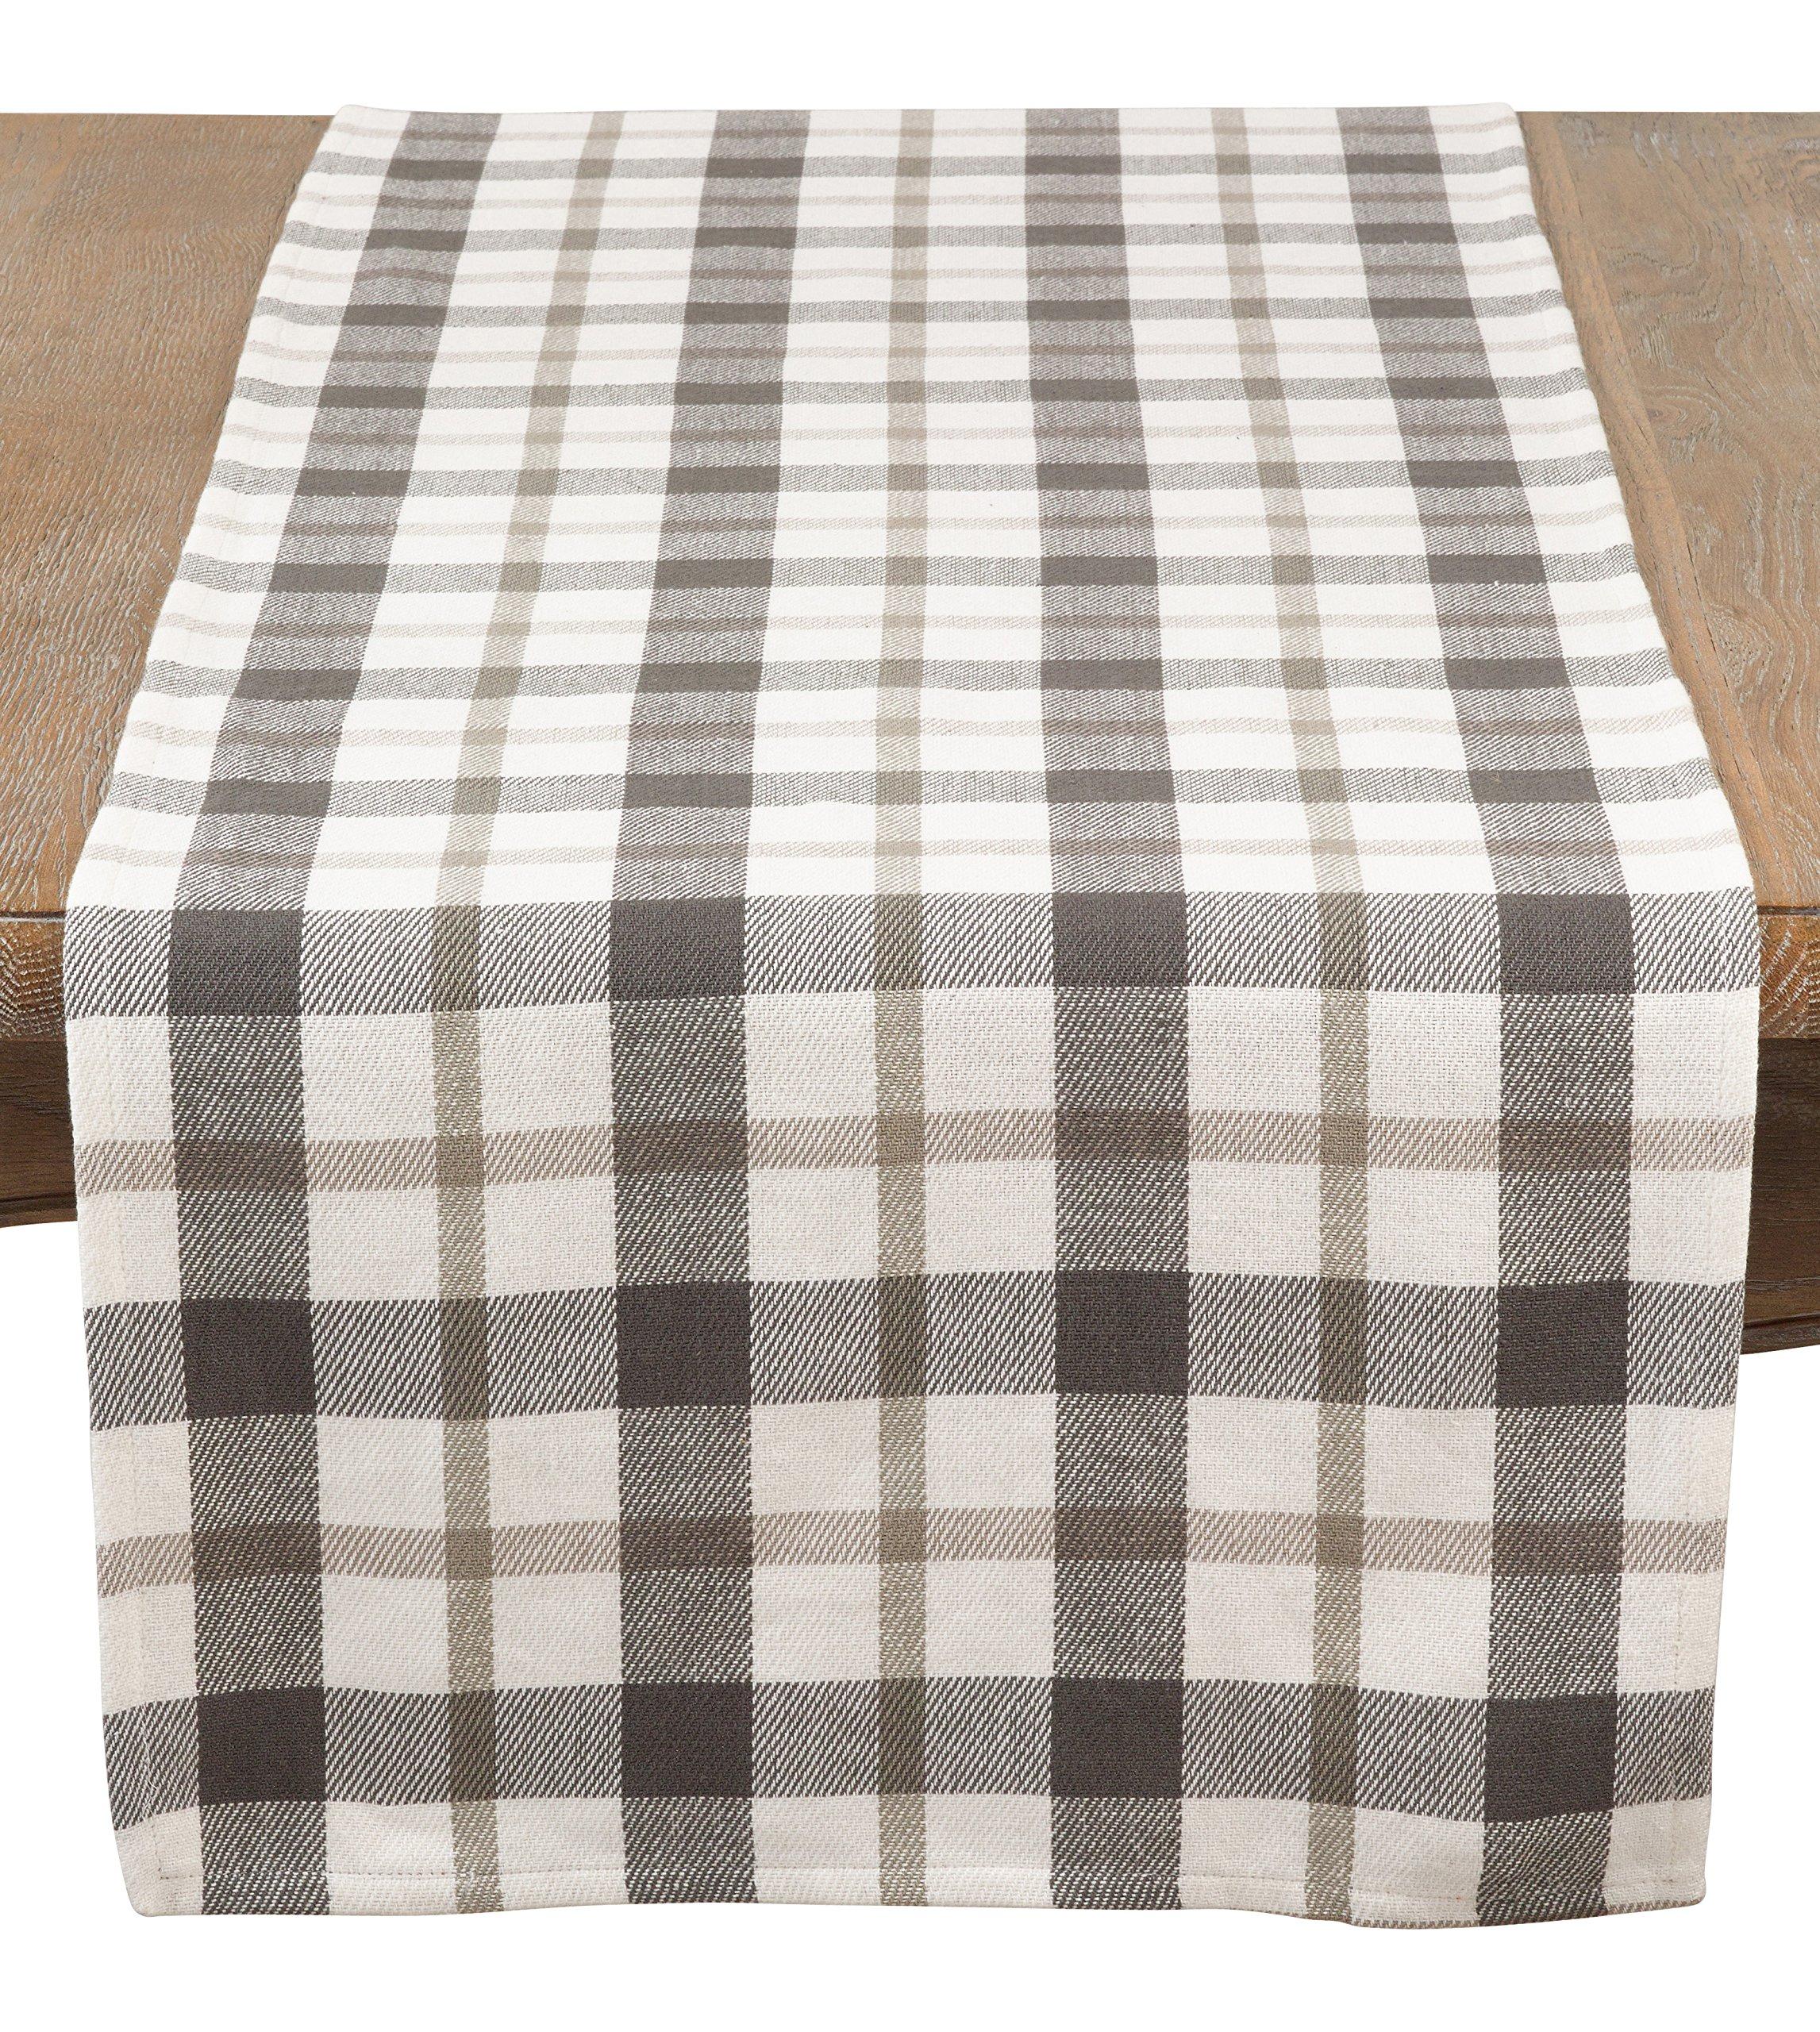 SARO LIFESTYLE Yuri Collection Plaid Design Cotton Table Runner, 16'' x 72'', Grey